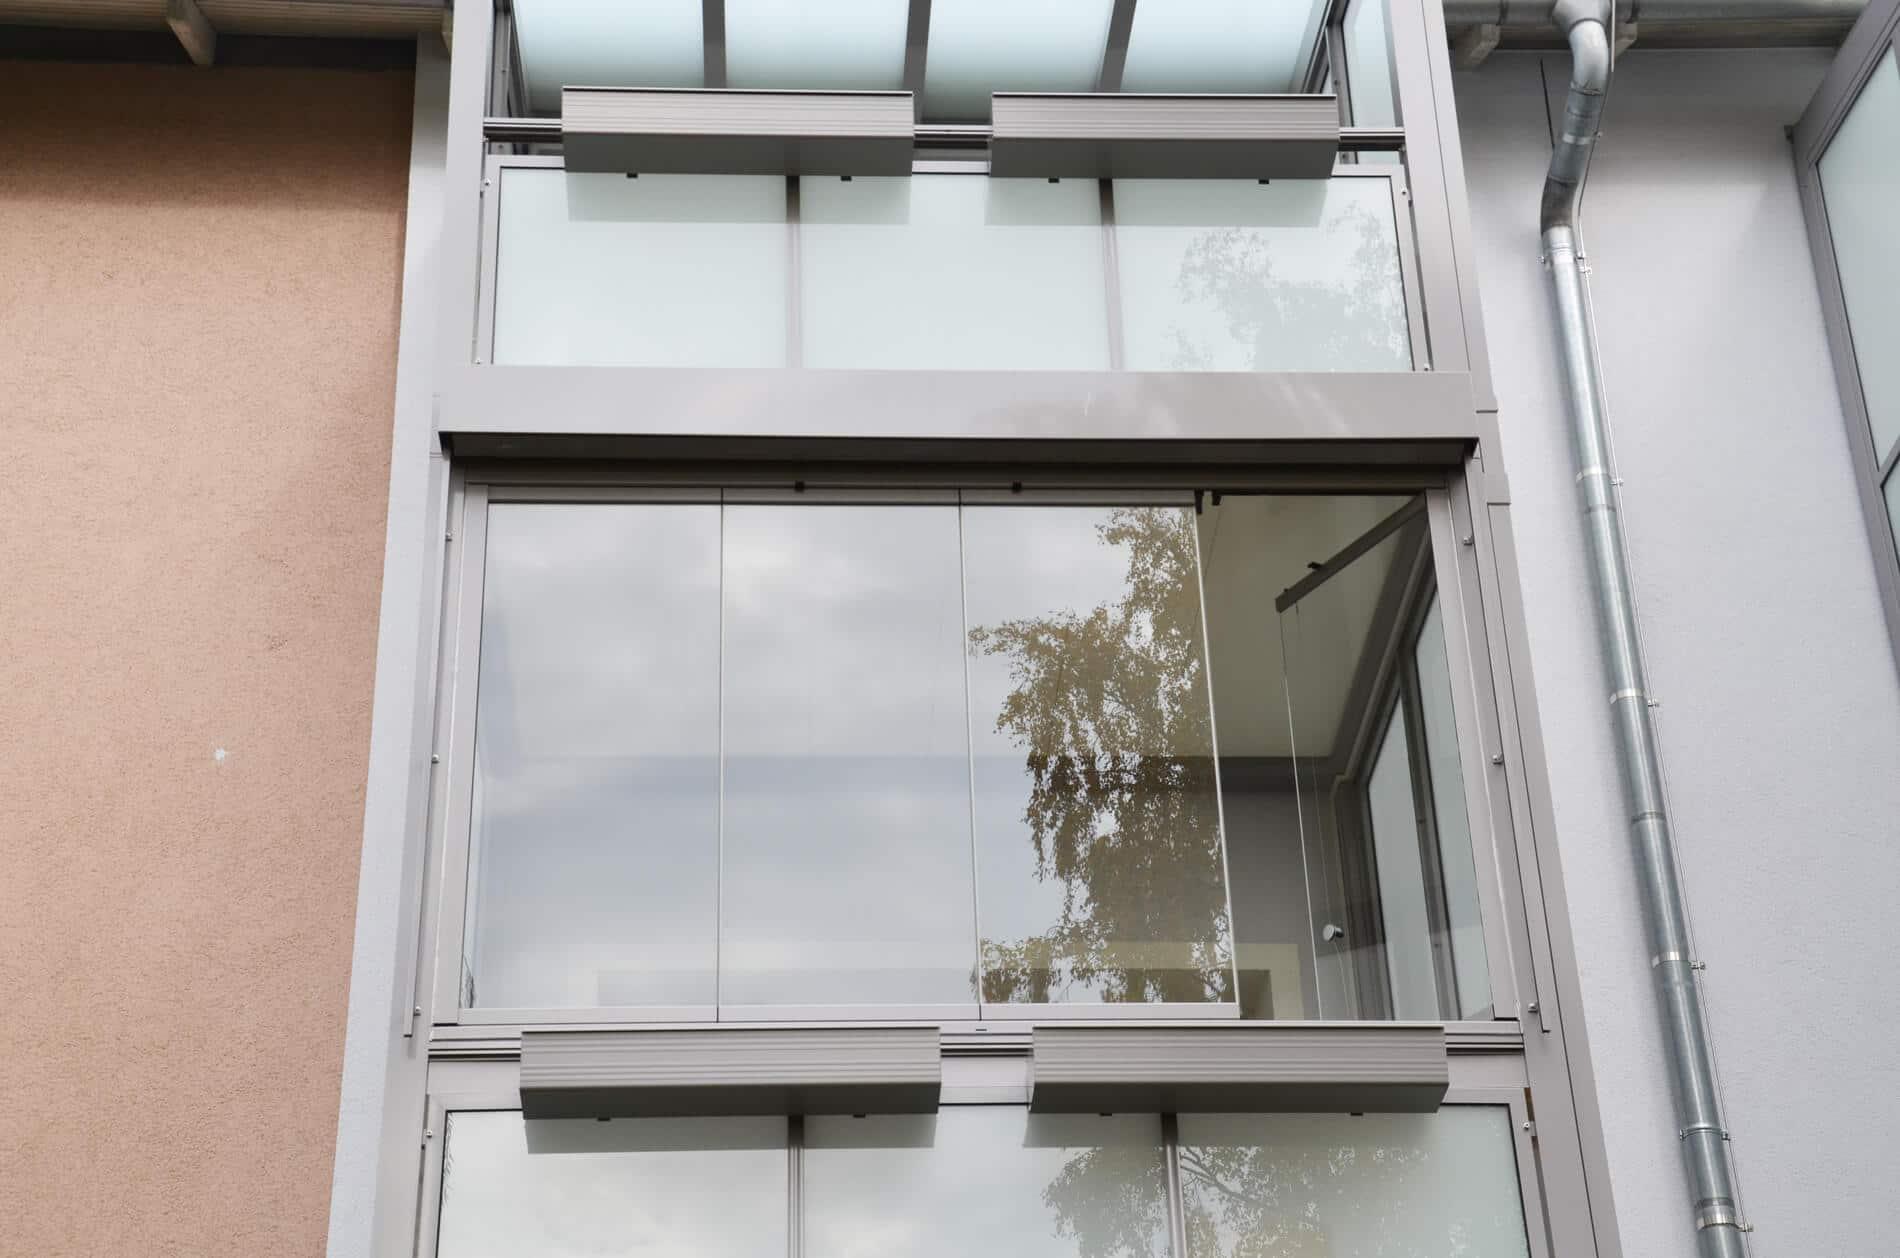 Balkonverbau mit Glas